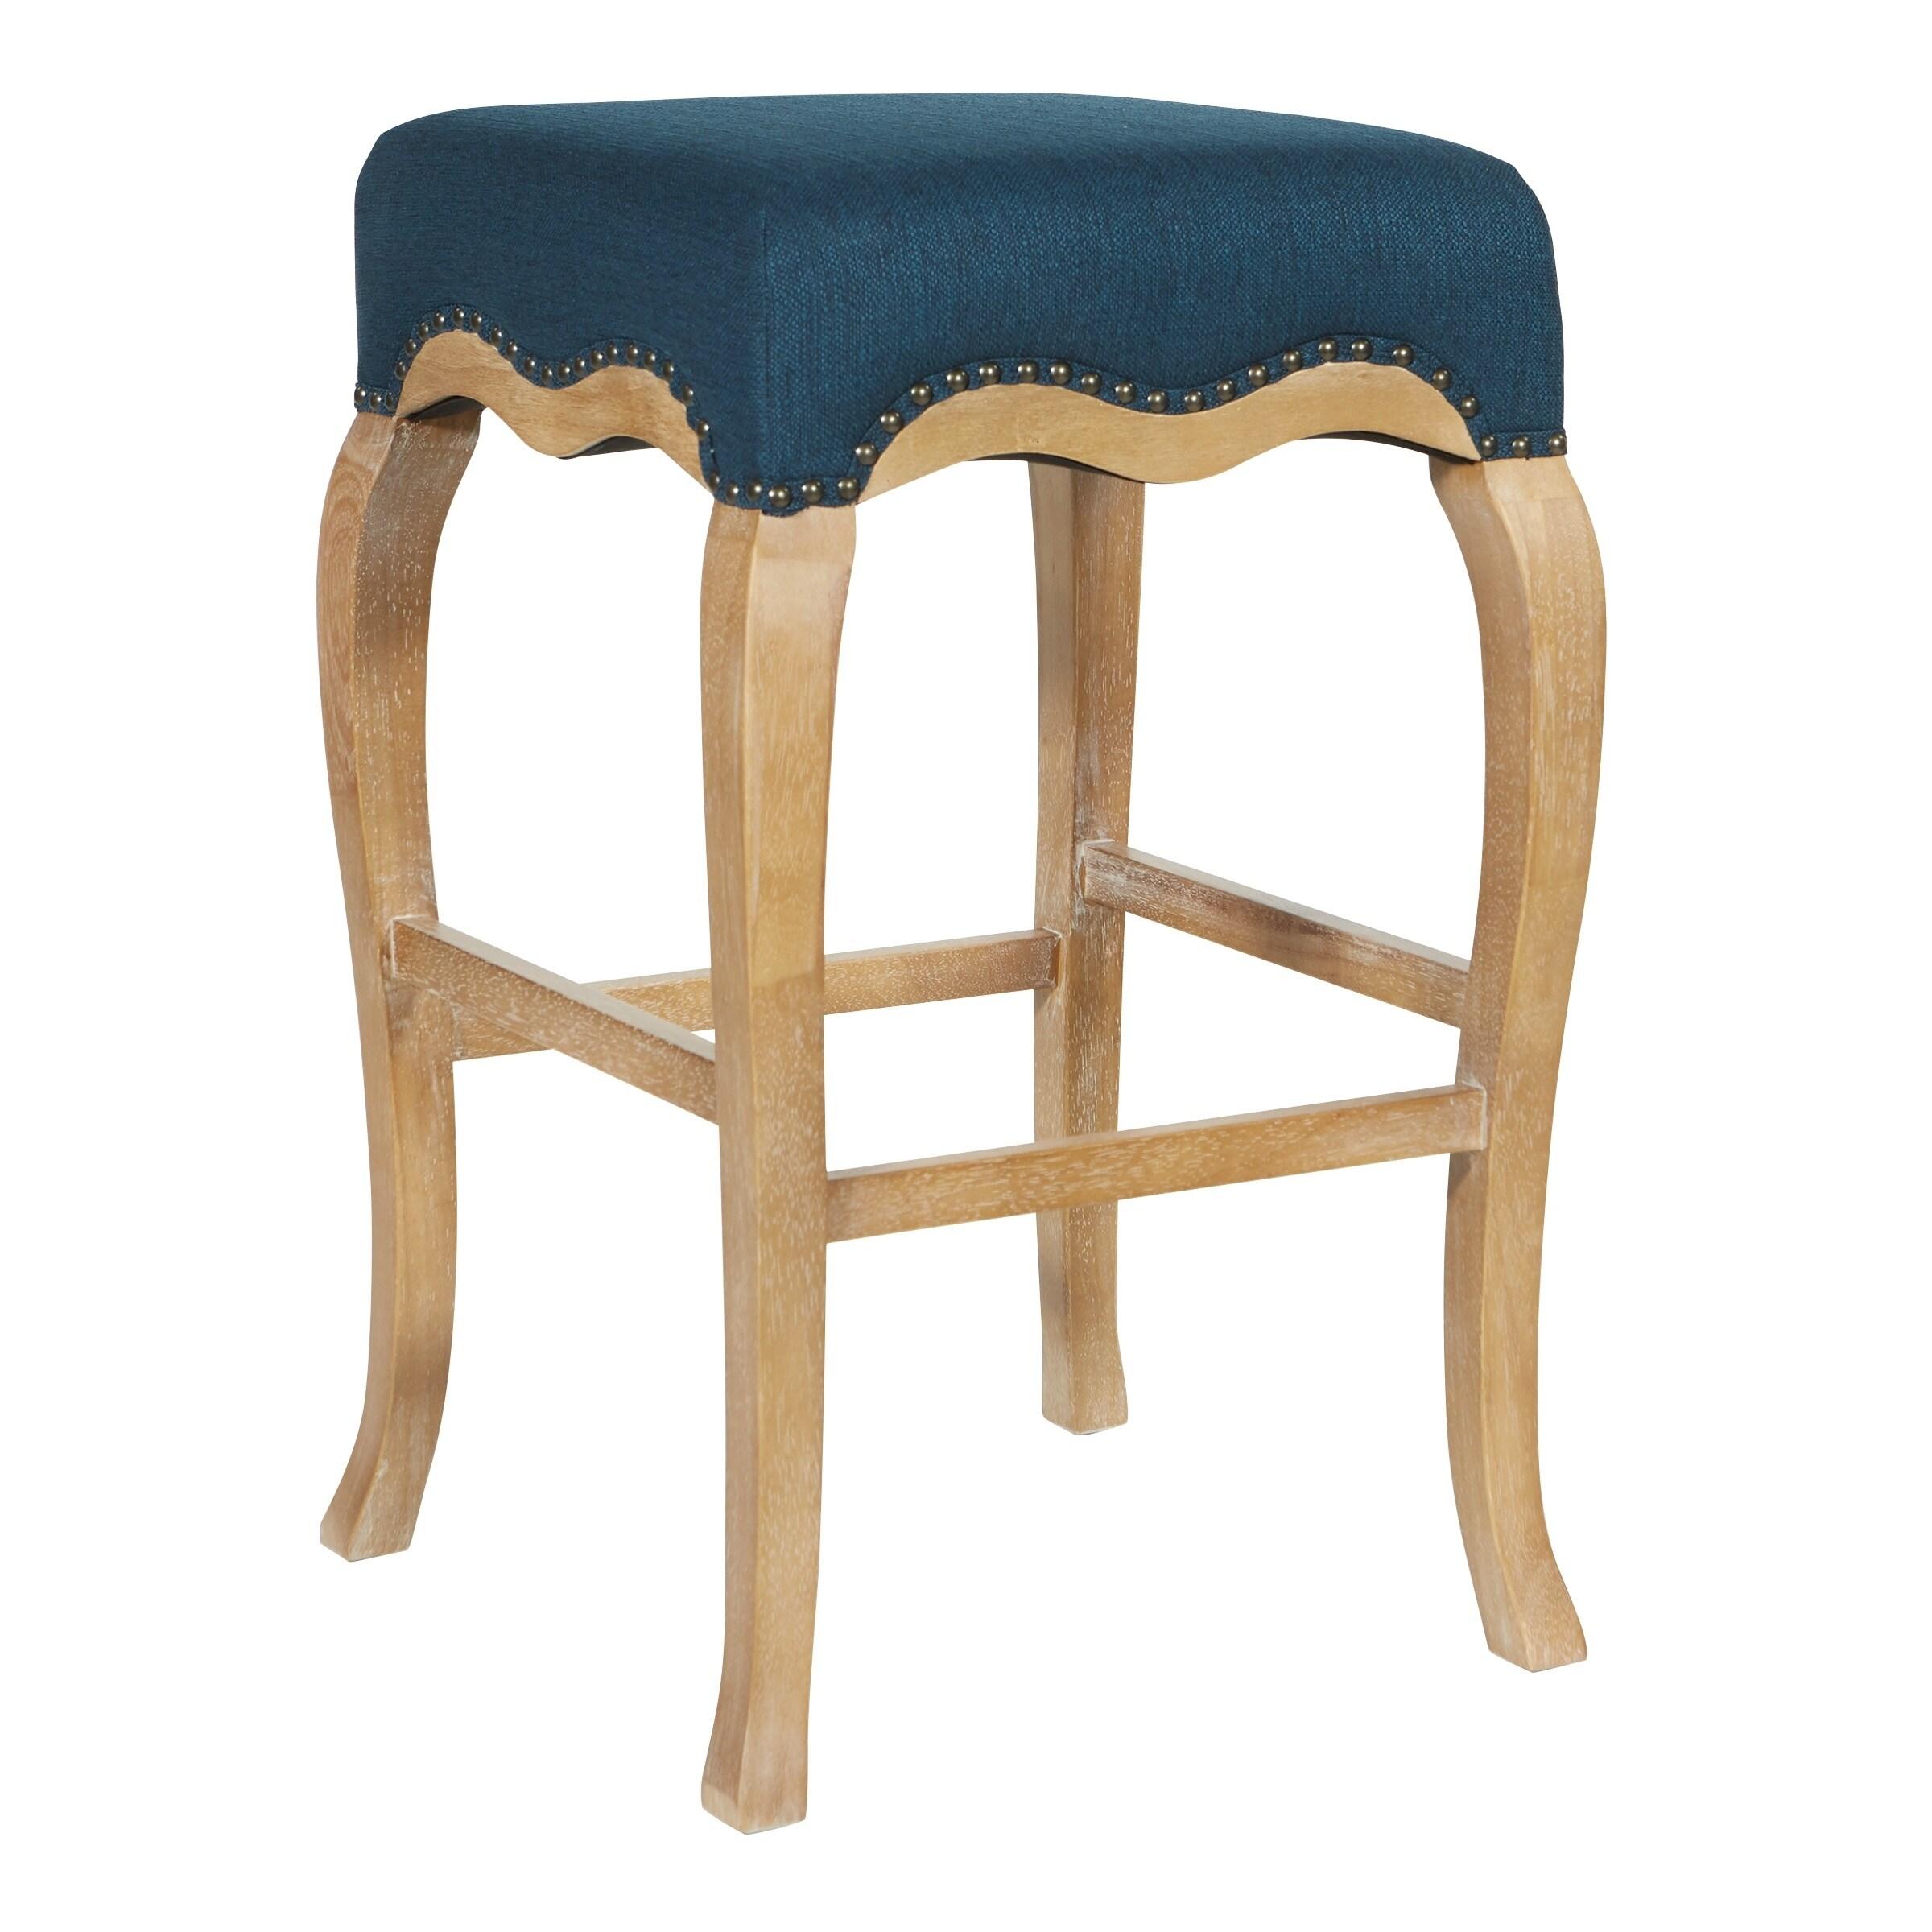 Remarkable Osp Home Furnishings Maya 30 Bar Stool Evergreenethics Interior Chair Design Evergreenethicsorg